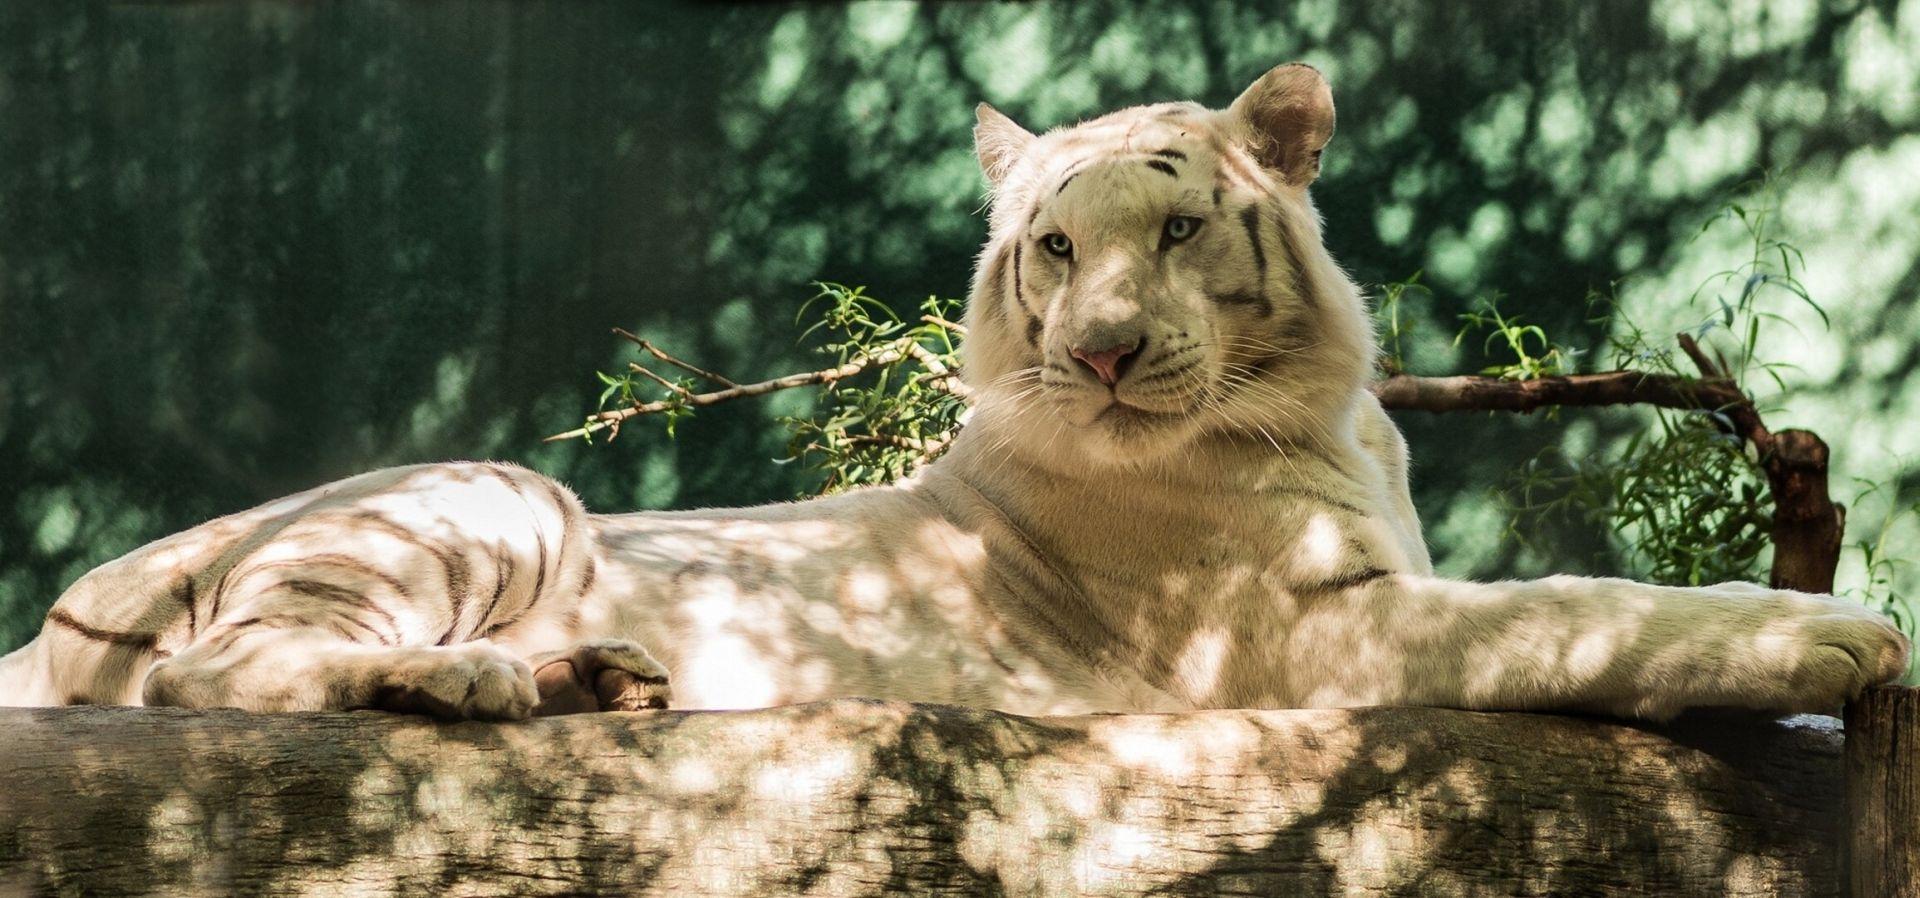 White Tiger, Computer Wallpaper